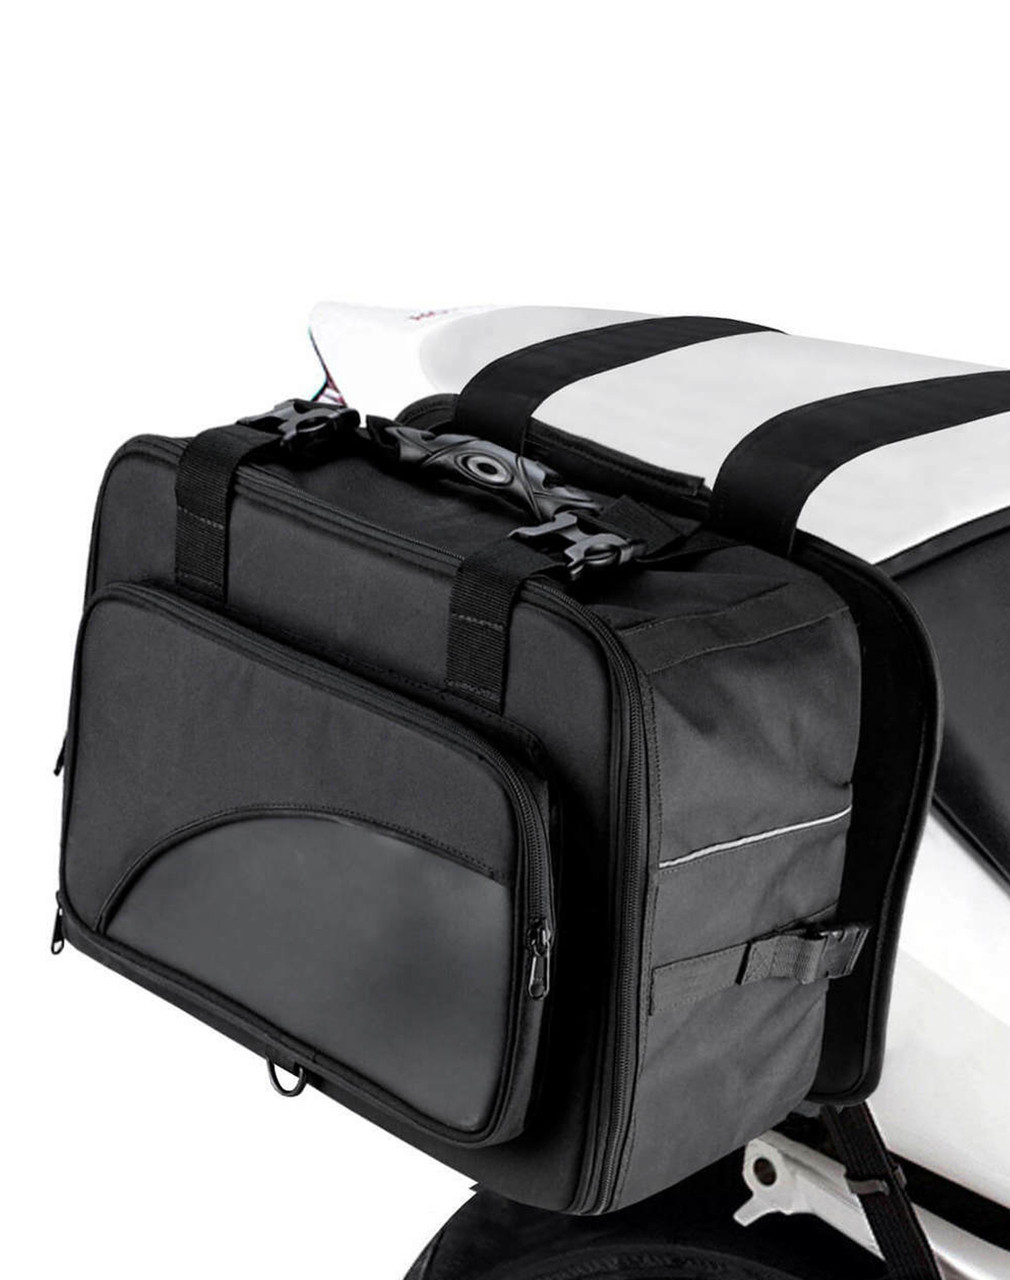 Viking Extra Large Black Motorcycle Triumph Bonneville T120 Saddlebags Bag on Bike Side View